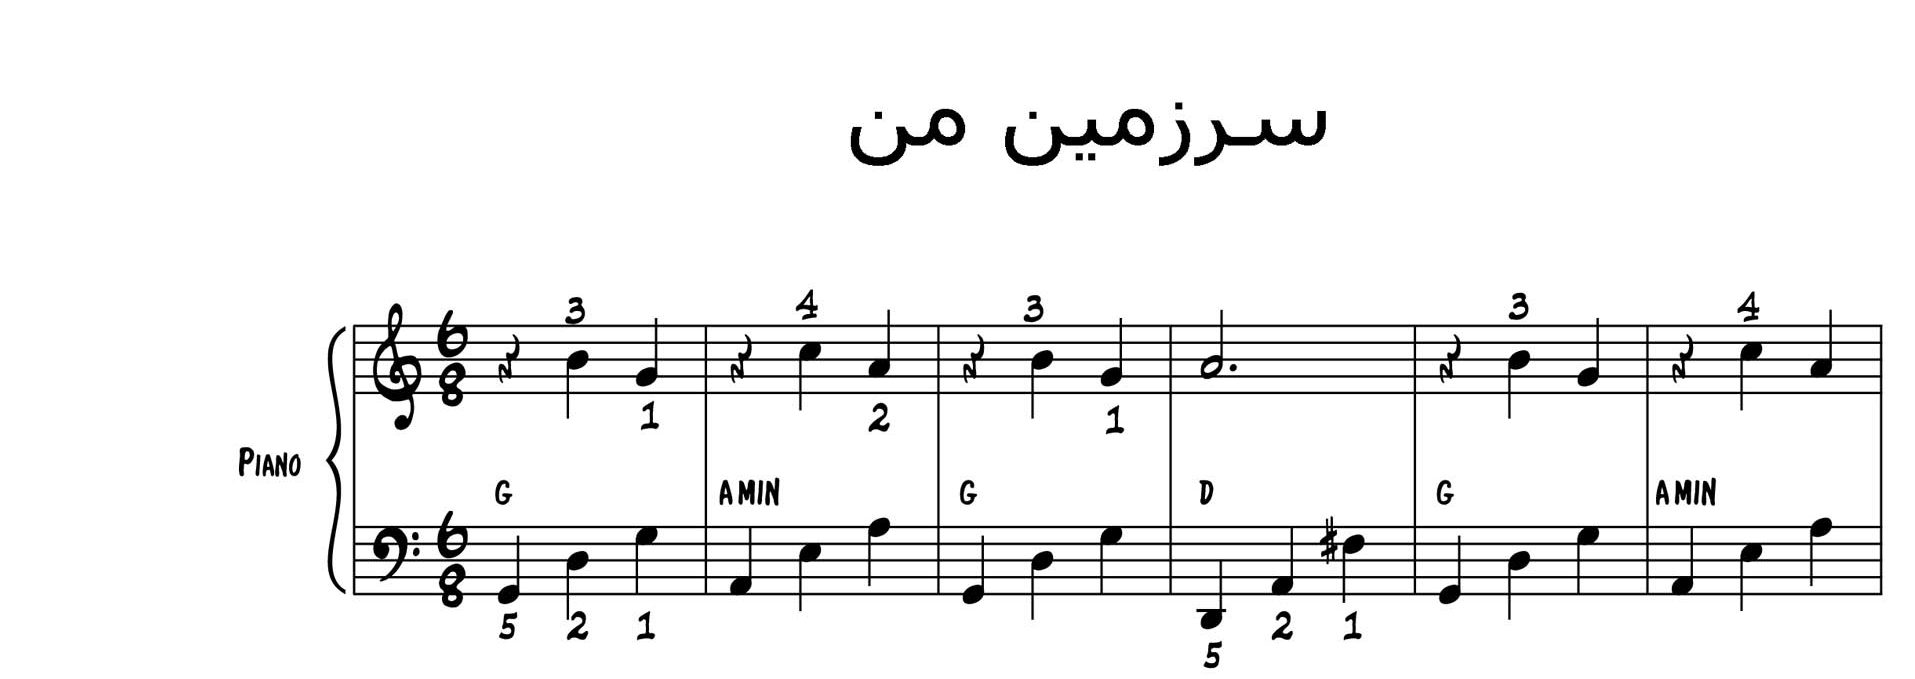 نت پیانوی آهنگ سرزمین من